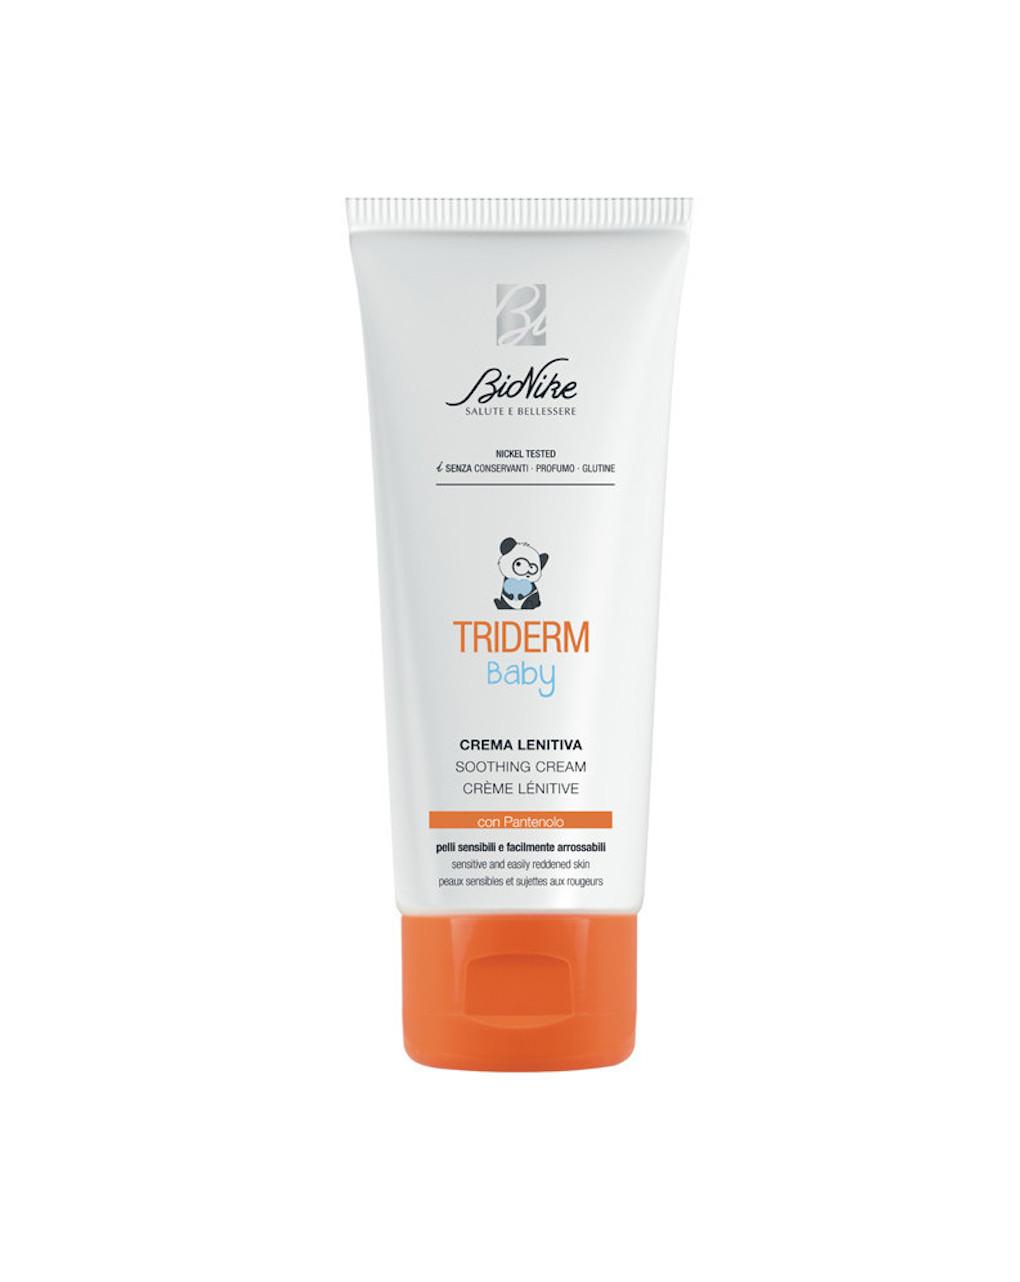 Triderm crema lenitiva 100 ml - BioNike